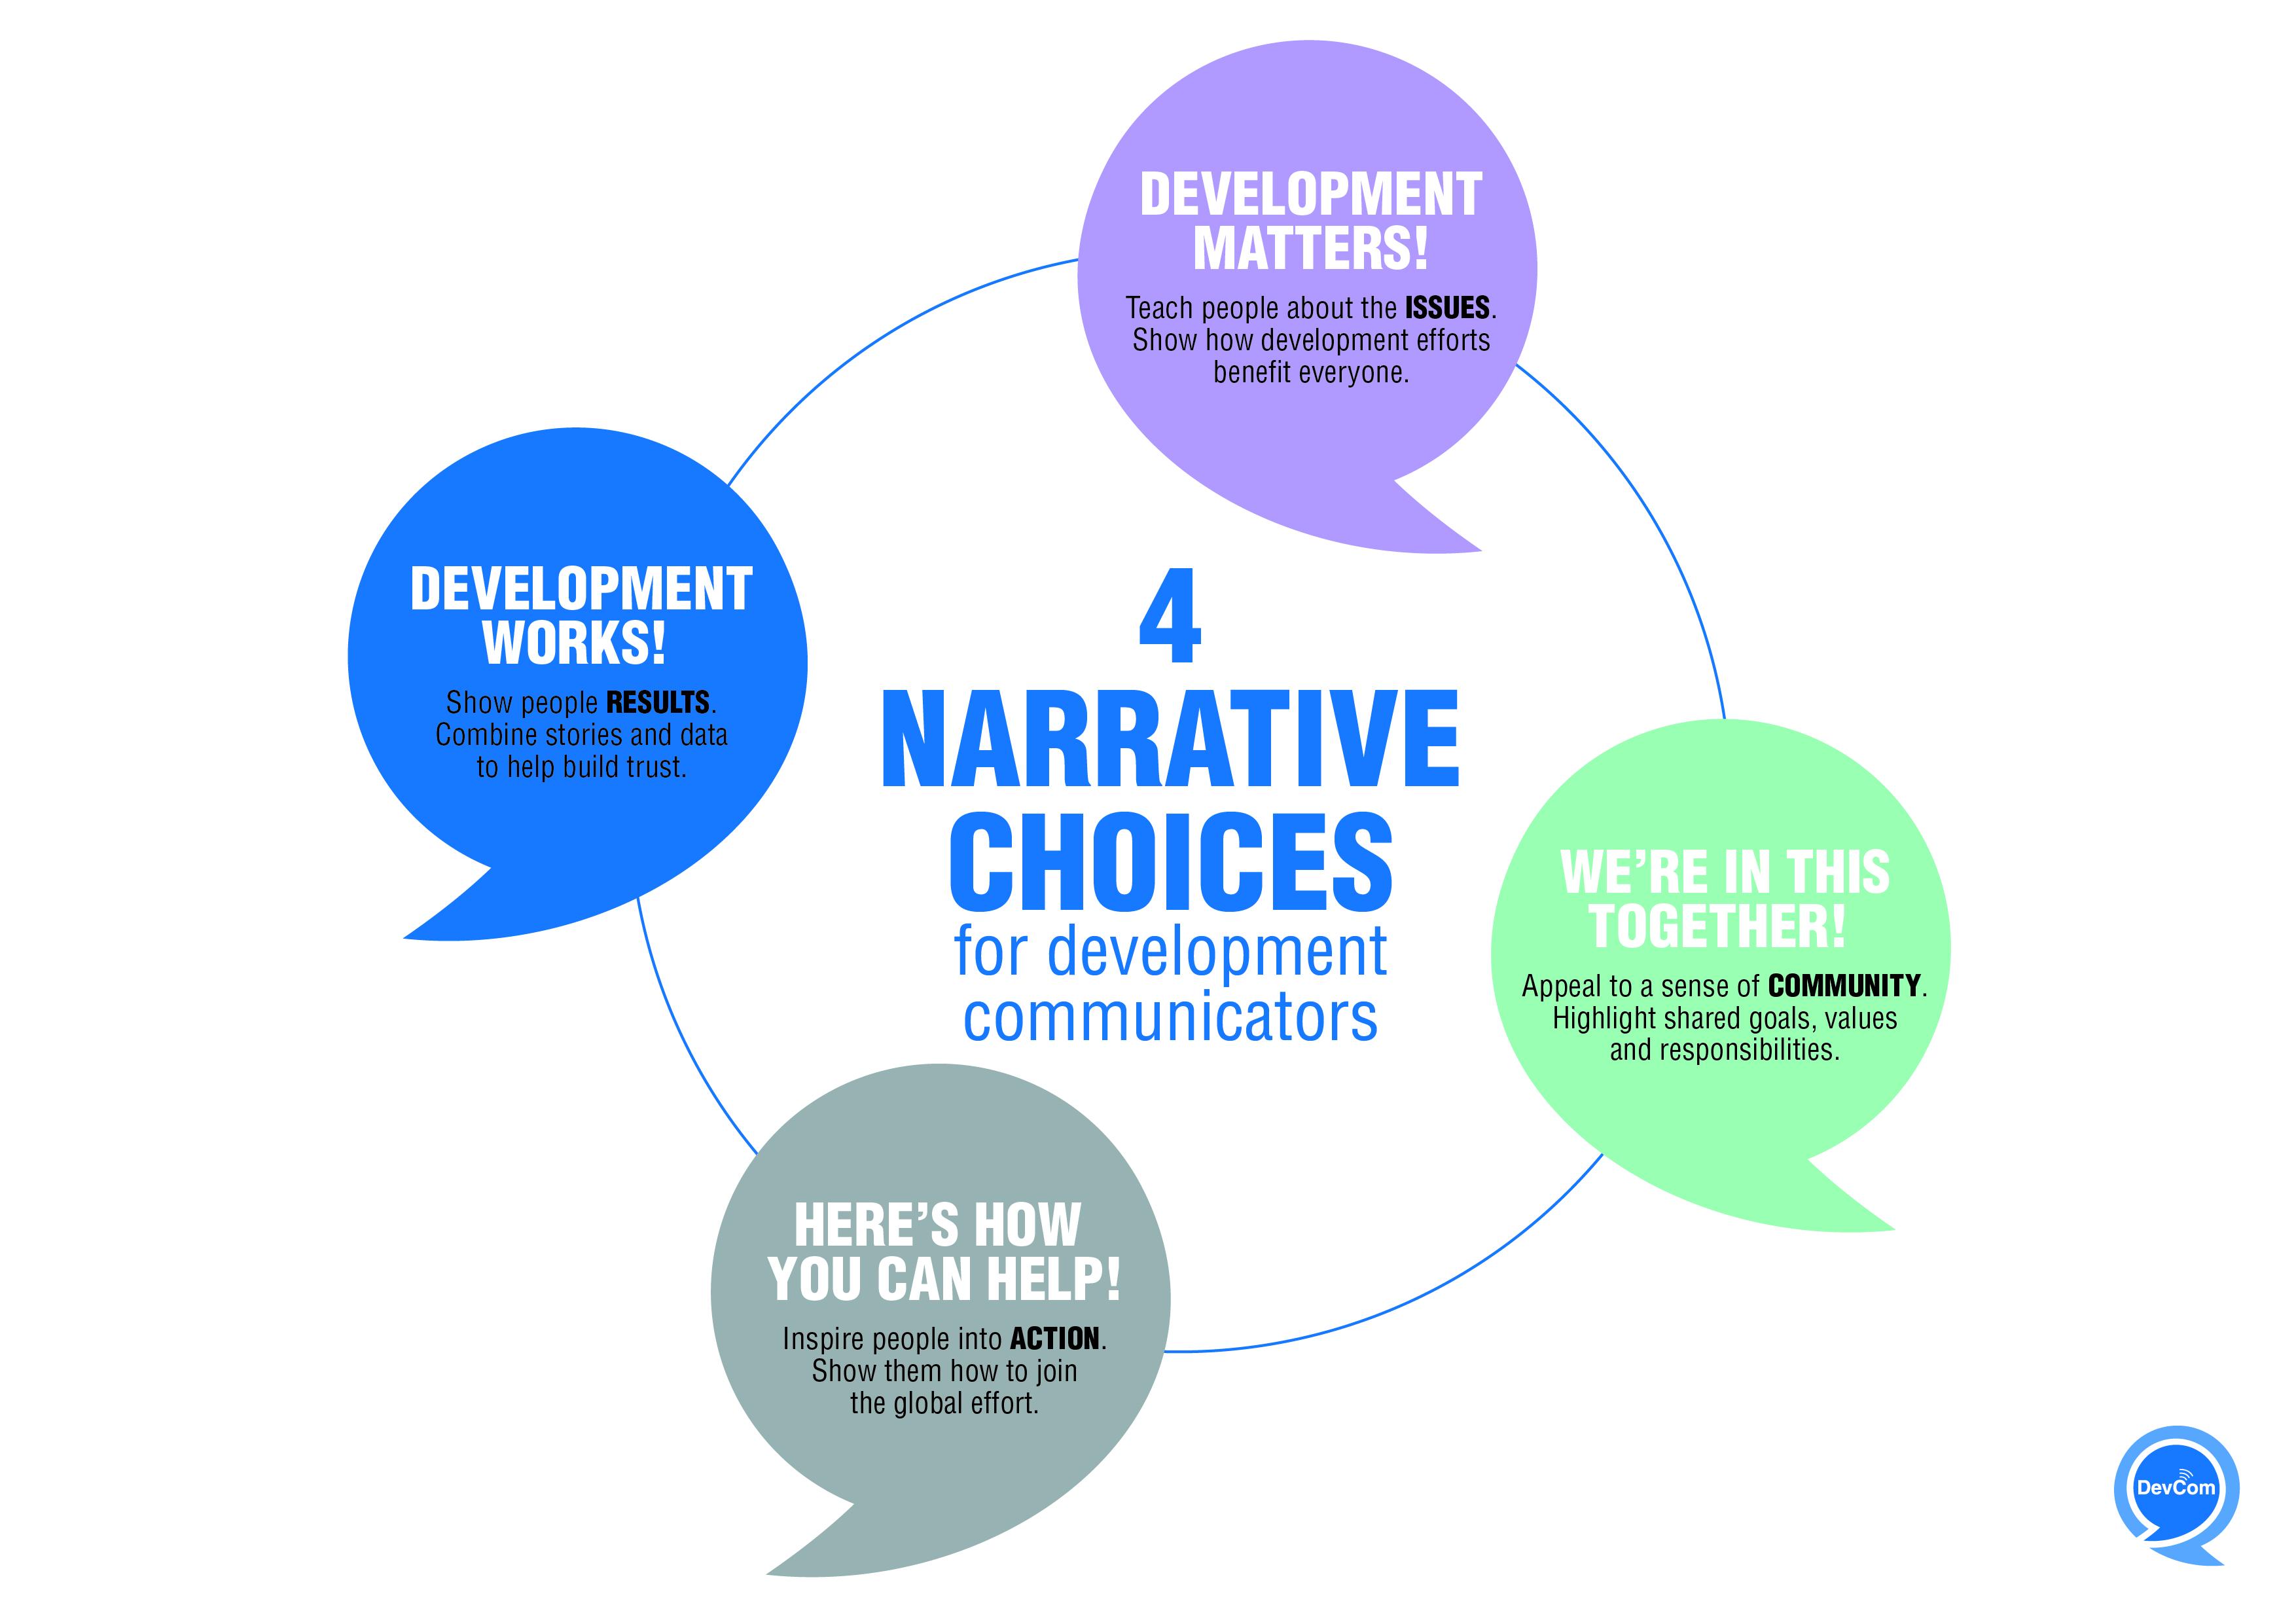 Infographic - 4 narrative choices for development communicators